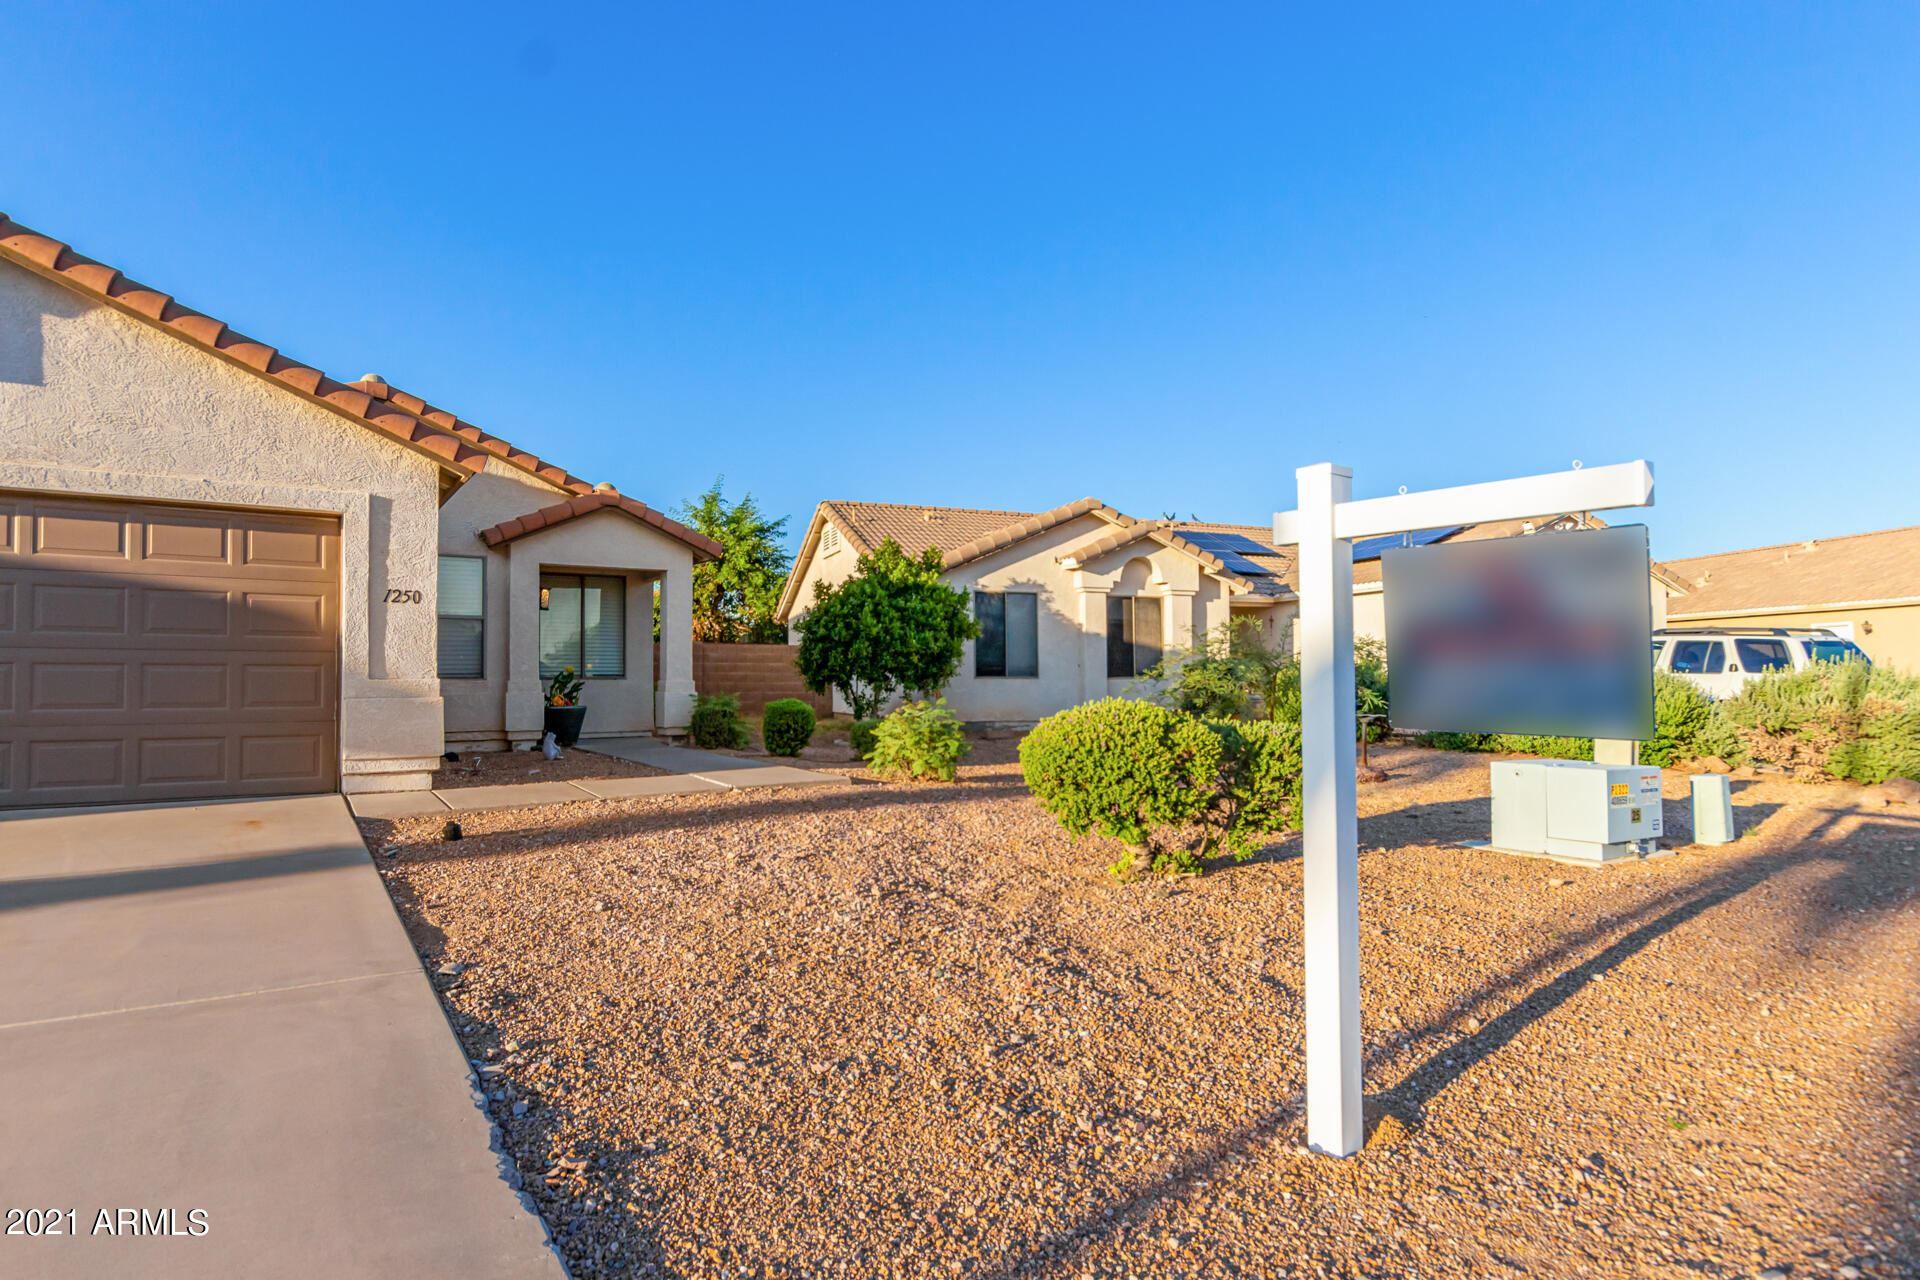 Photo of 1250 W 7TH Avenue, Apache Junction, AZ 85120 (MLS # 6304668)